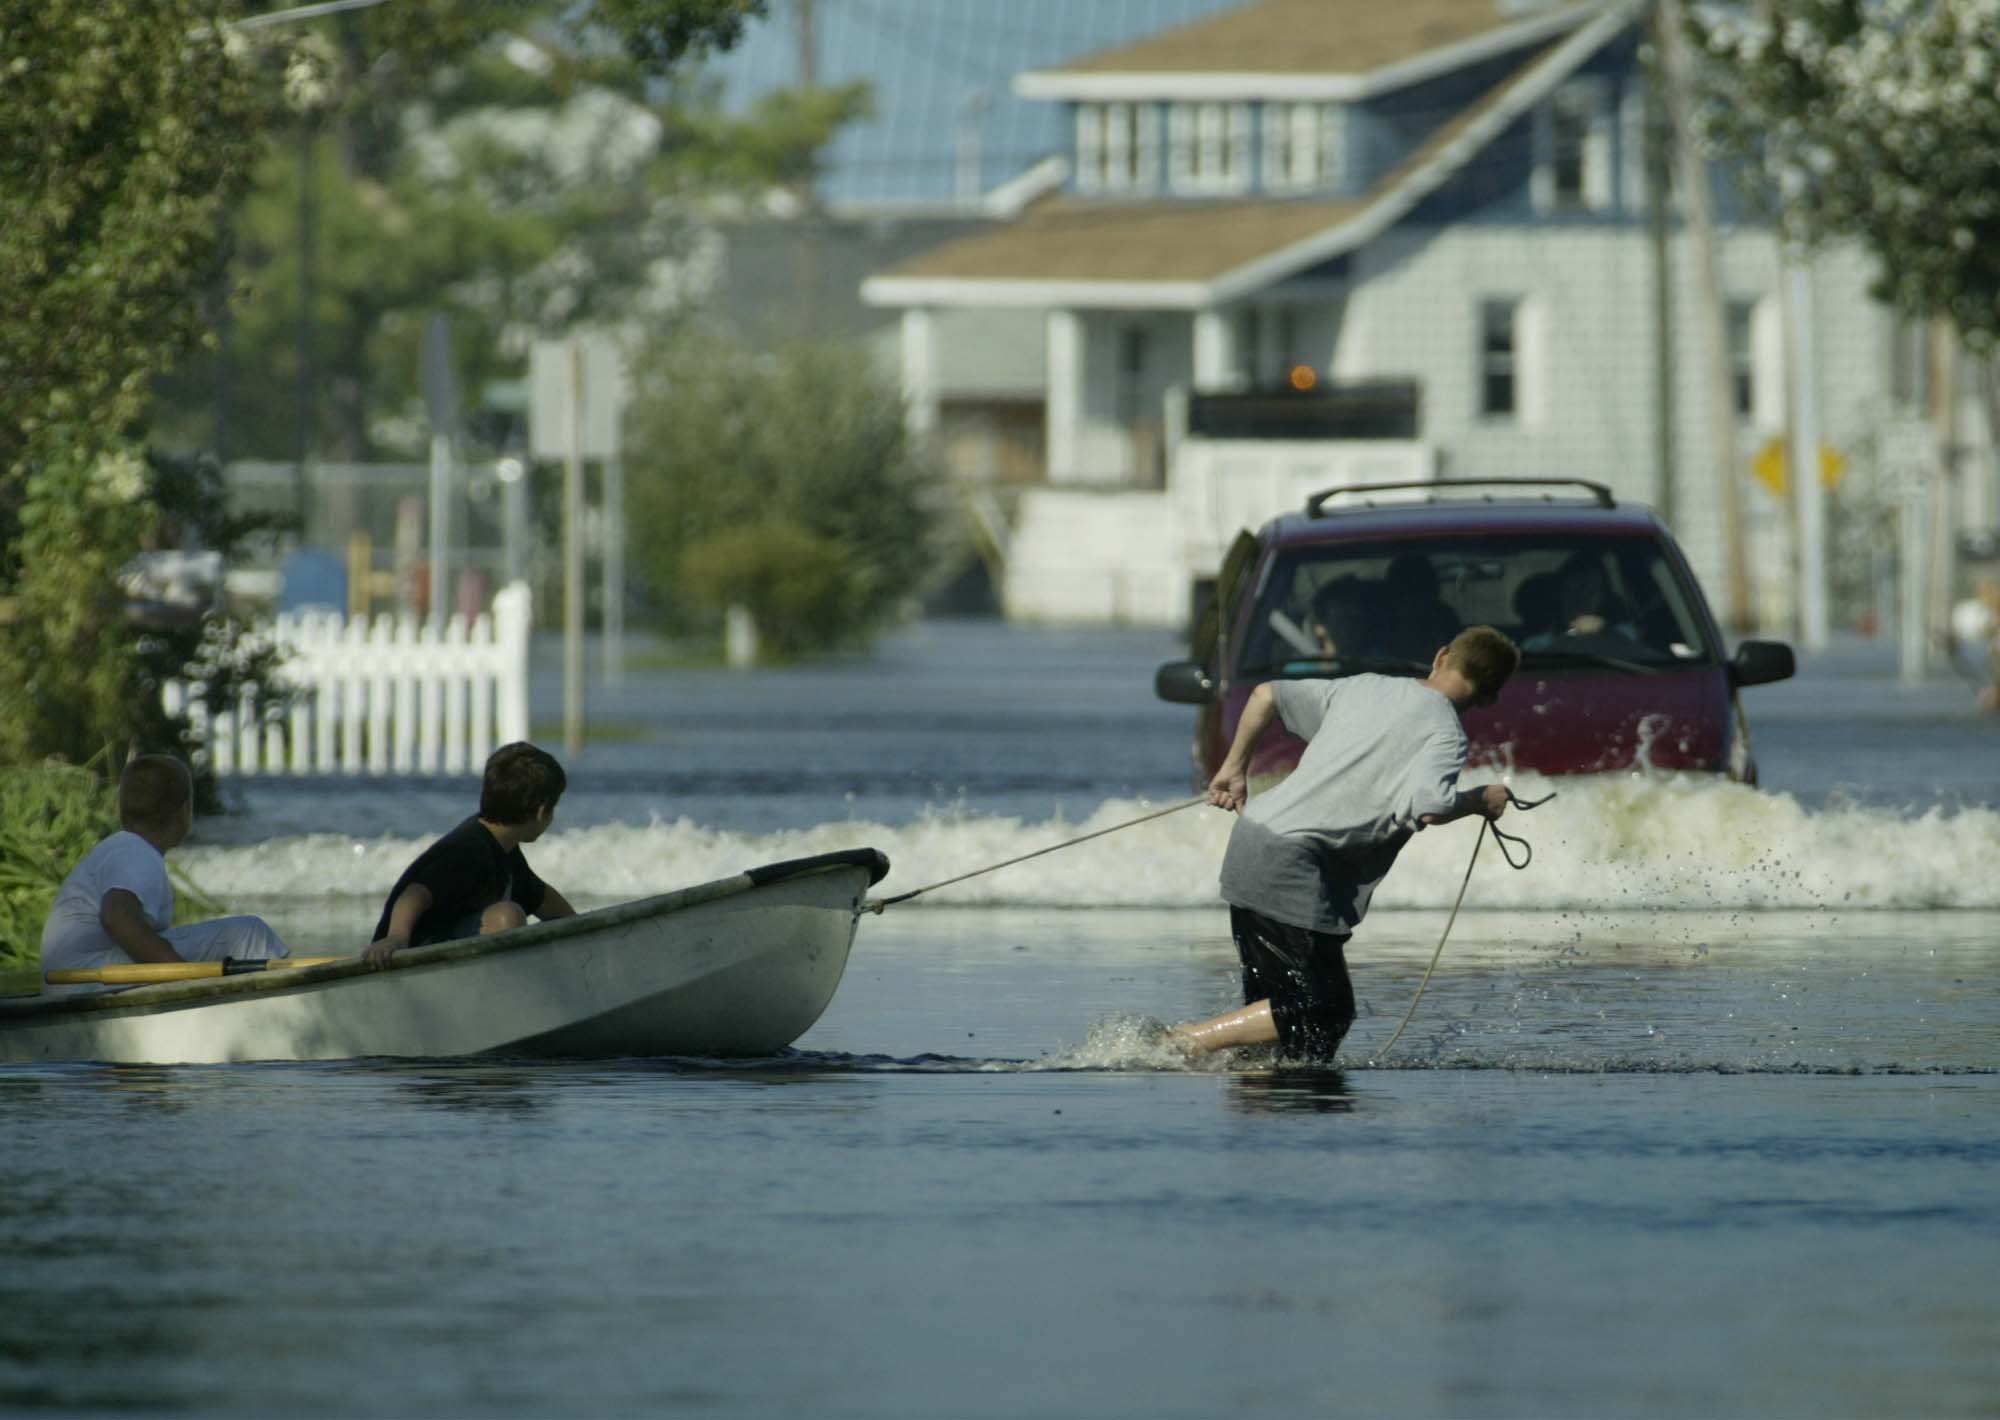 Looking back: Hurricane Isabel